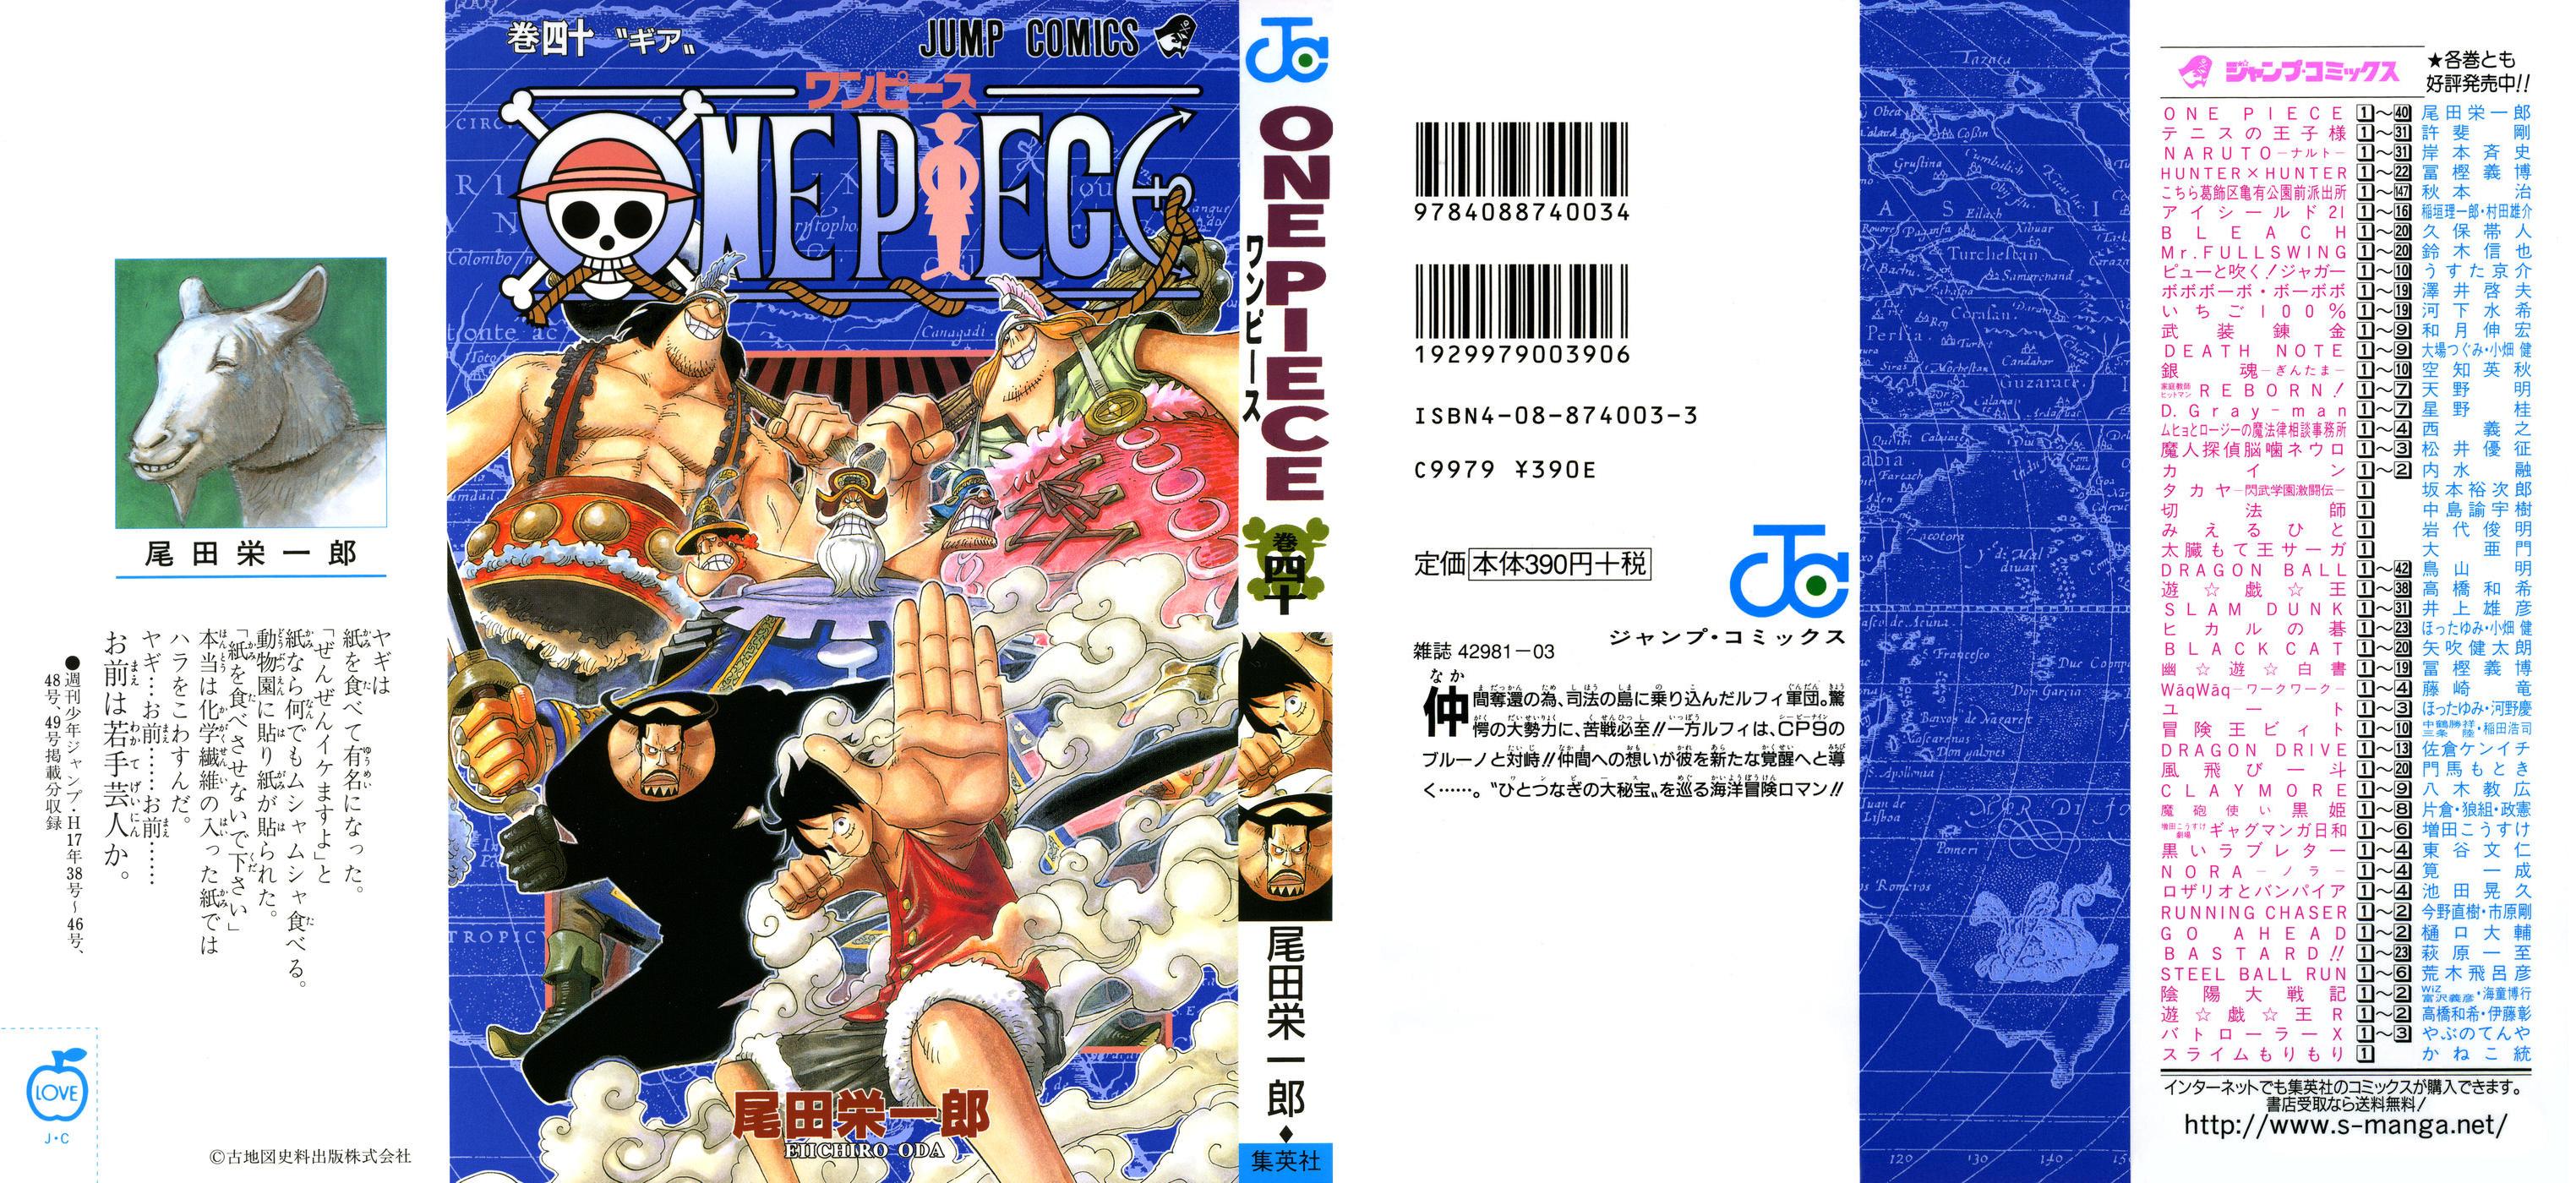 10764_One_Piece_v40_122_53lo.jpg